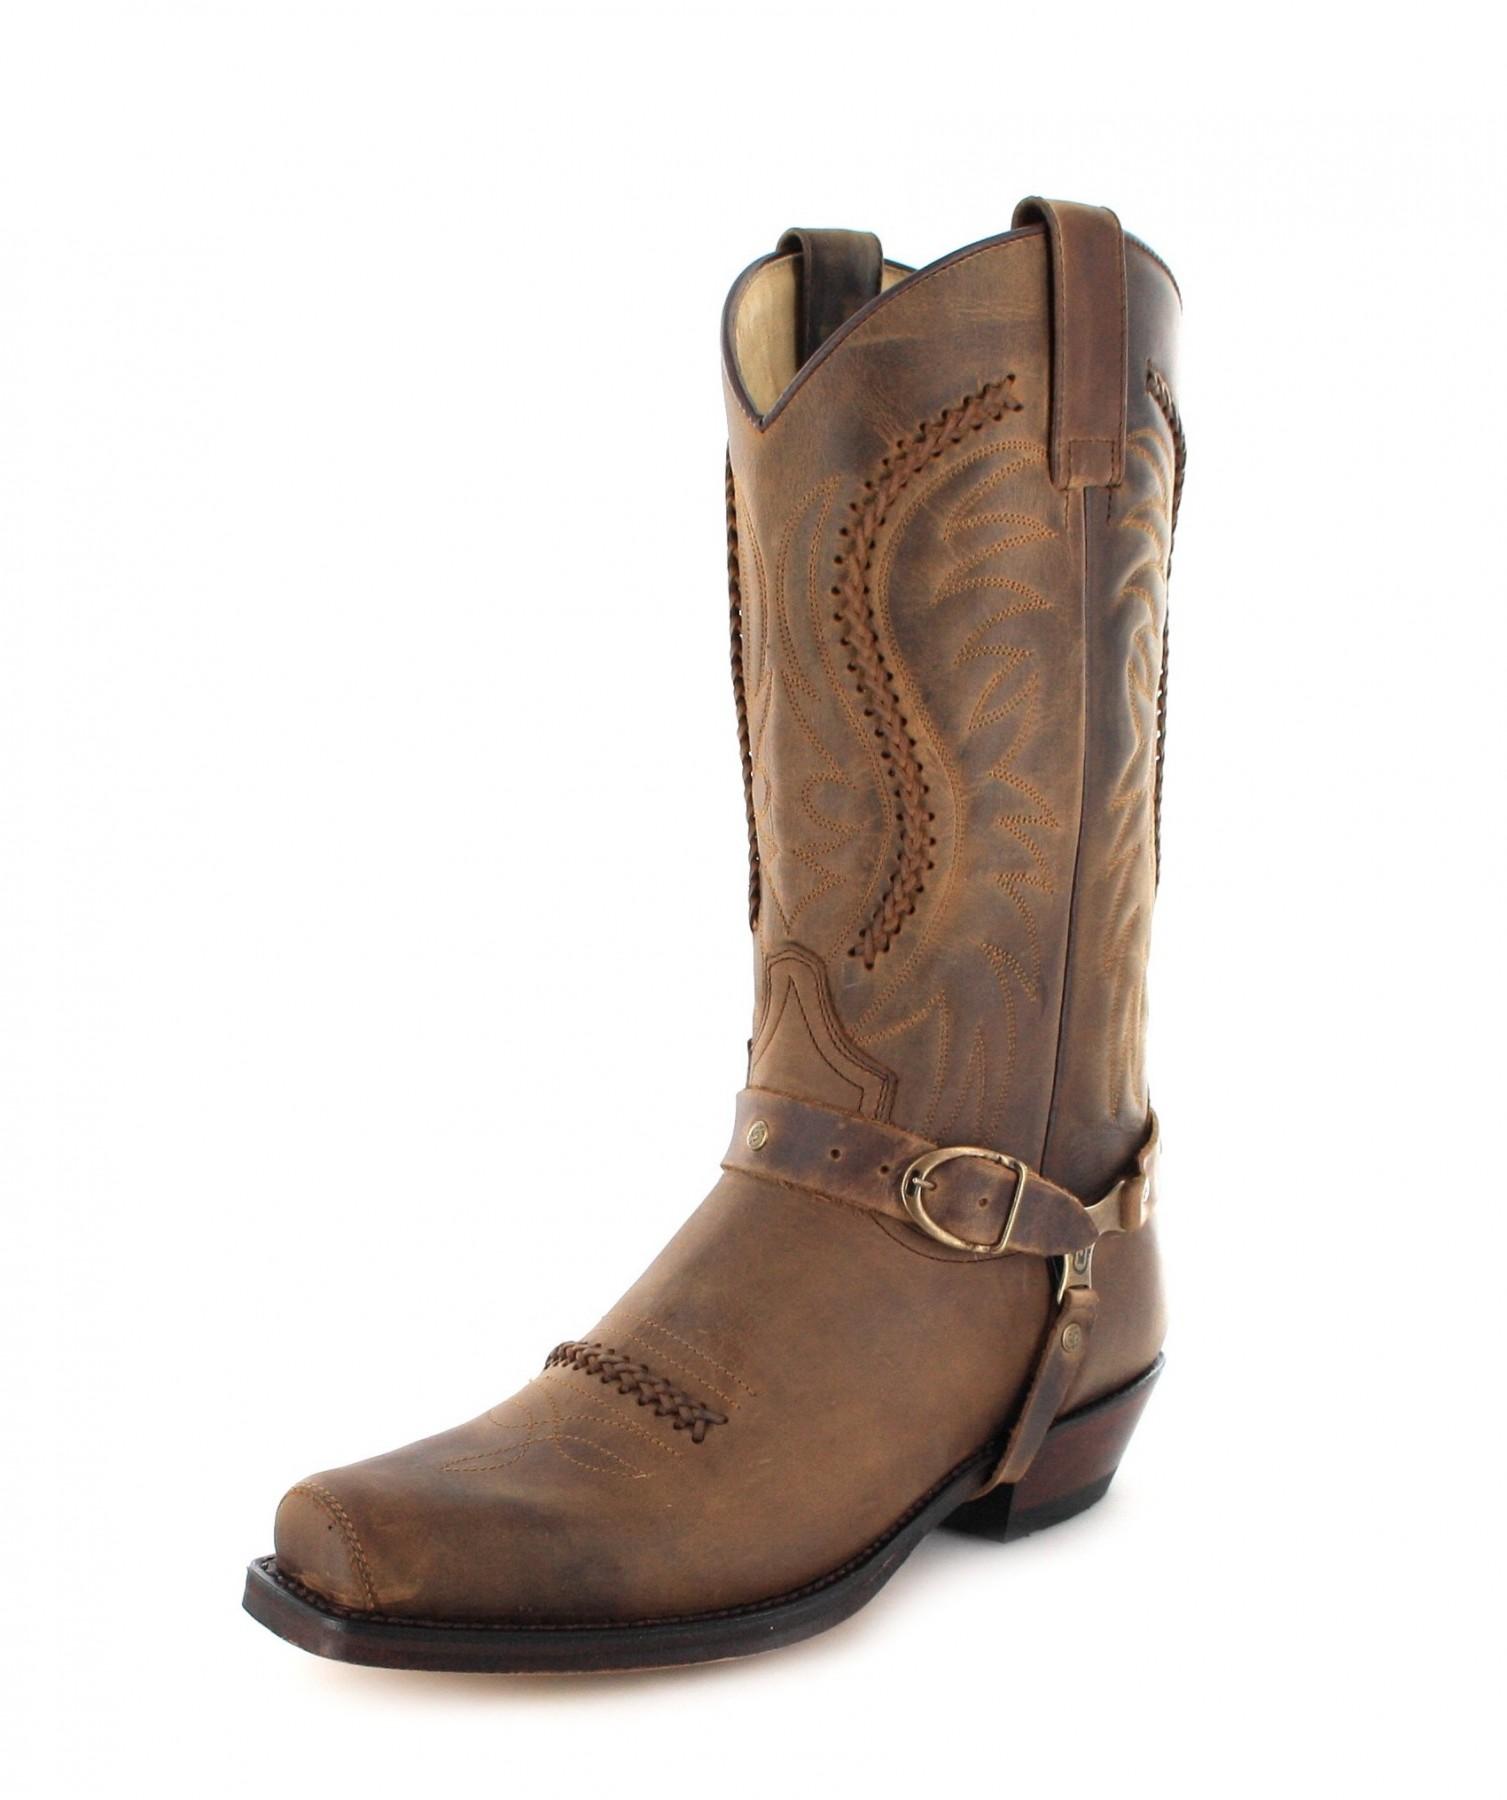 sendra boots 3434 tang biker boot - brown - image ... fzhxuks